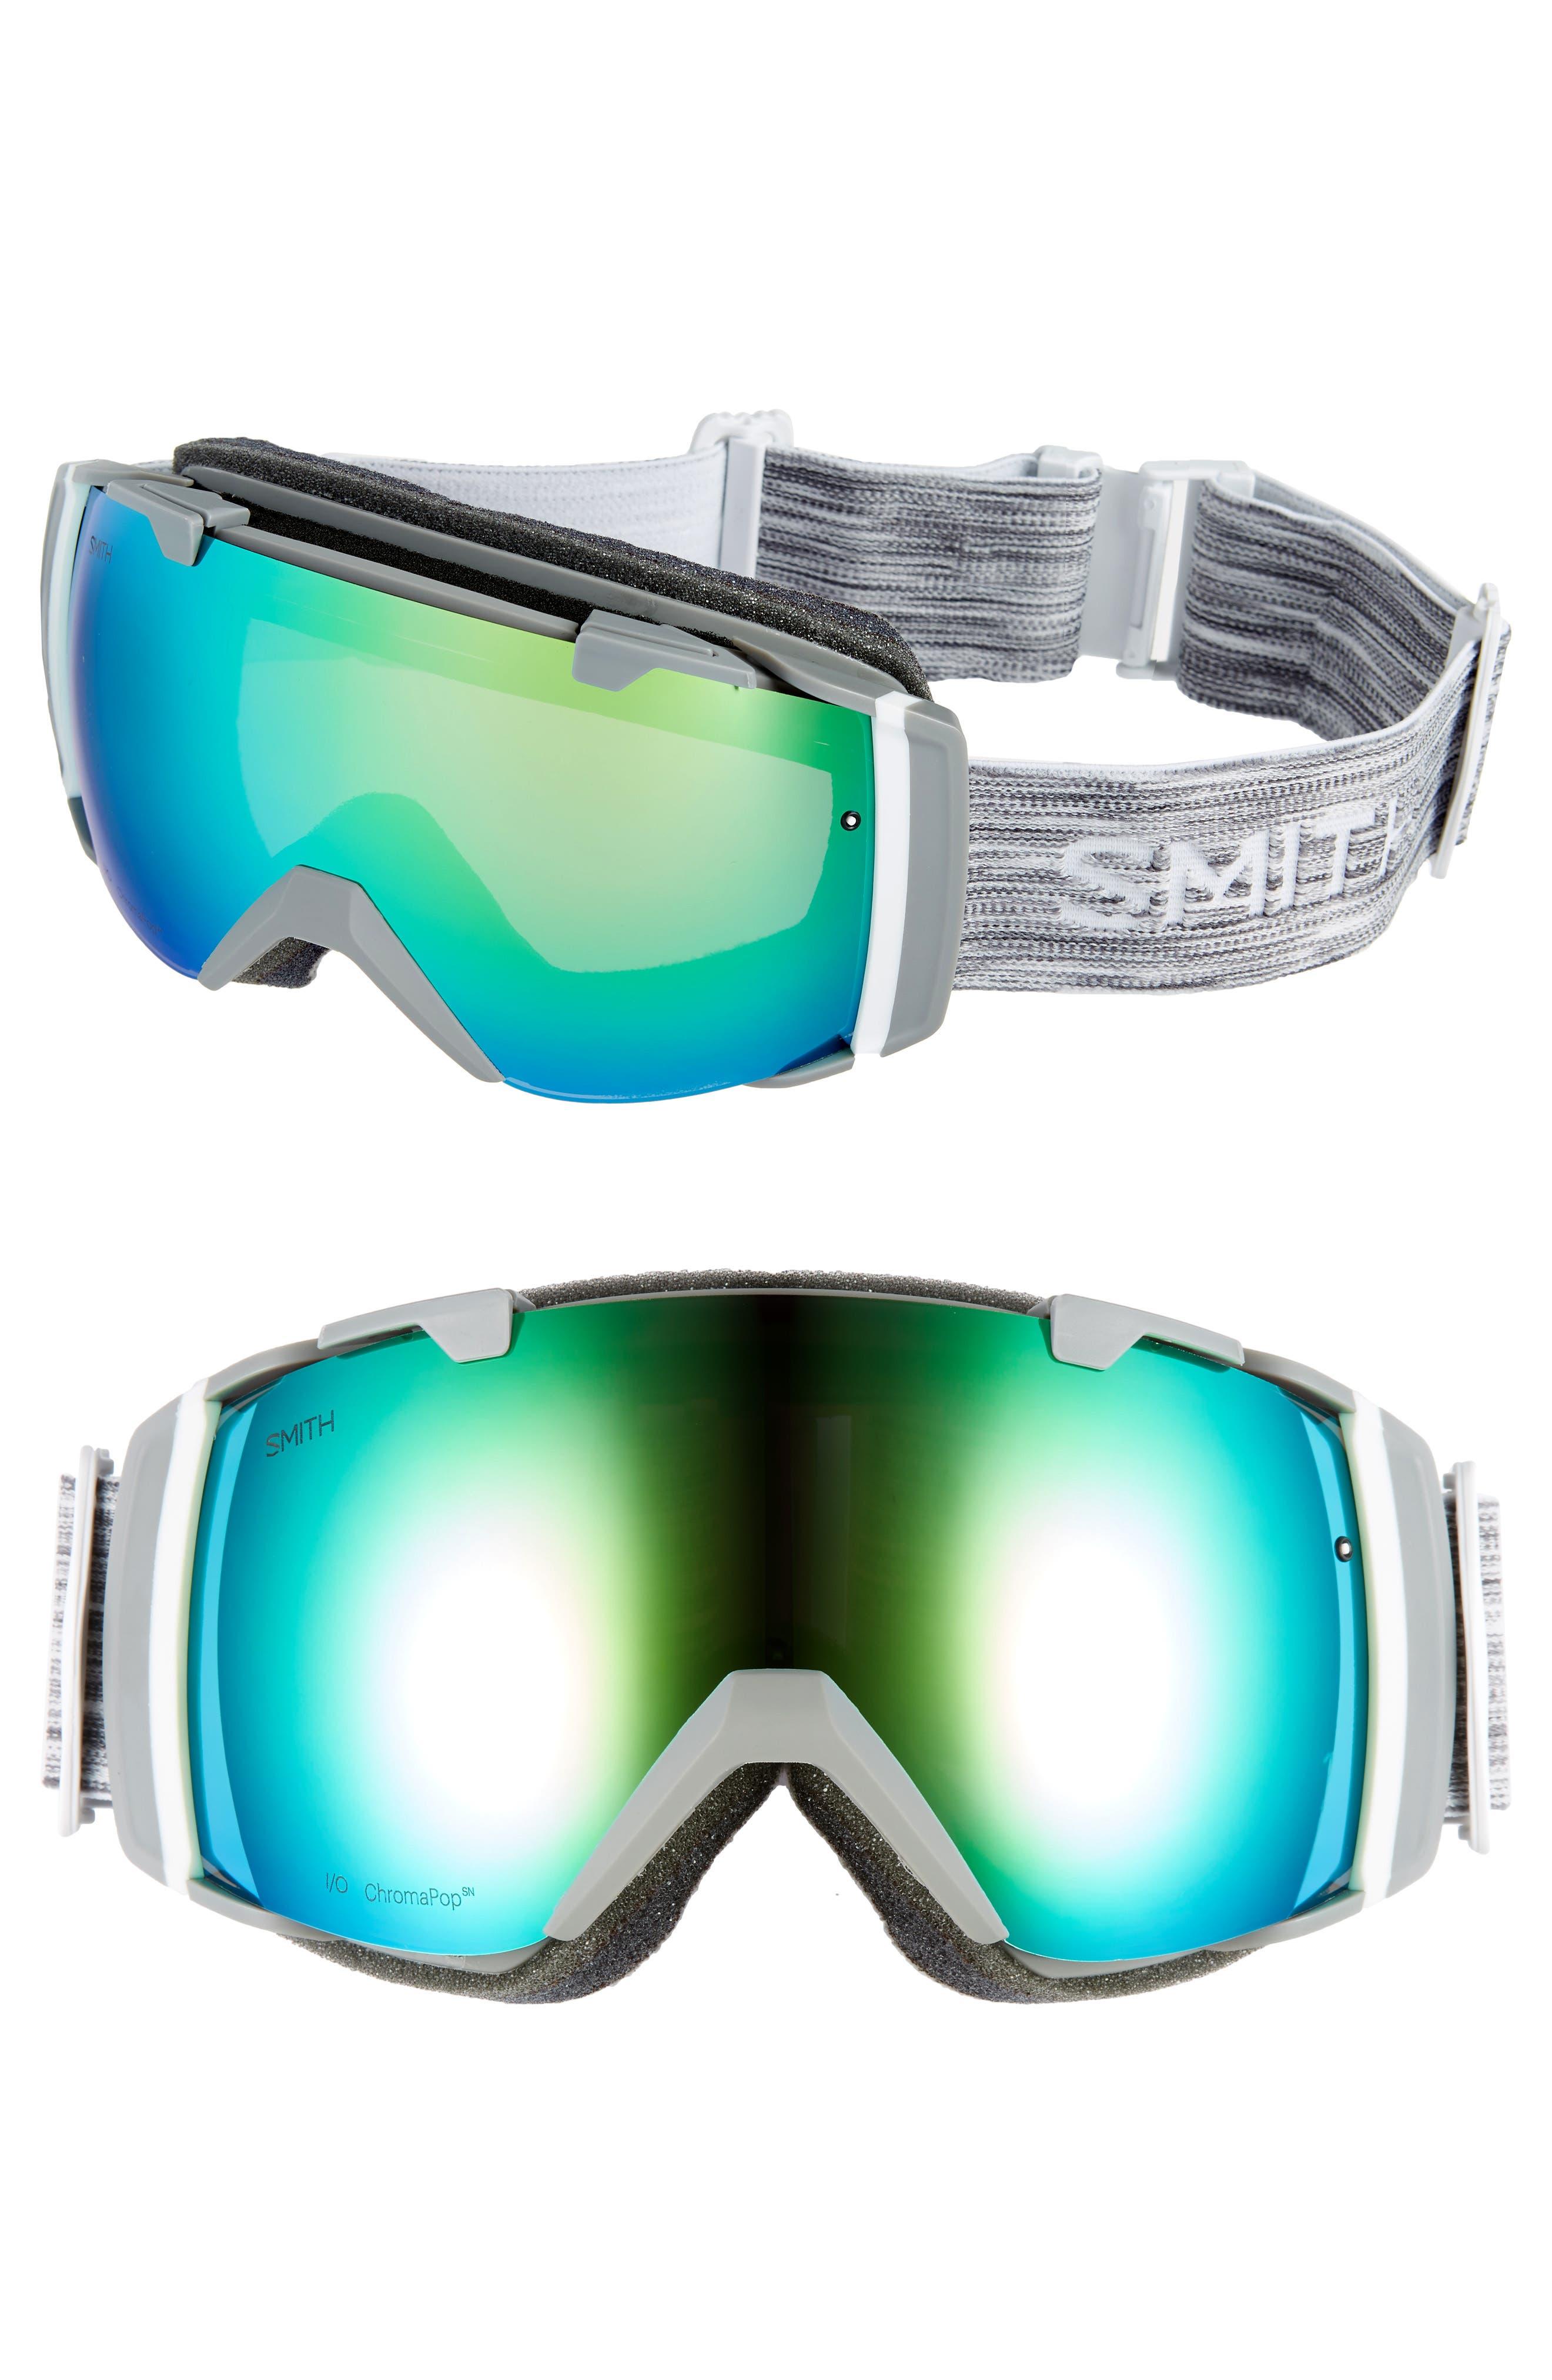 SMITH I/O 215mm ChromaPop Snow Goggles, Main, color, CLOUD GREY